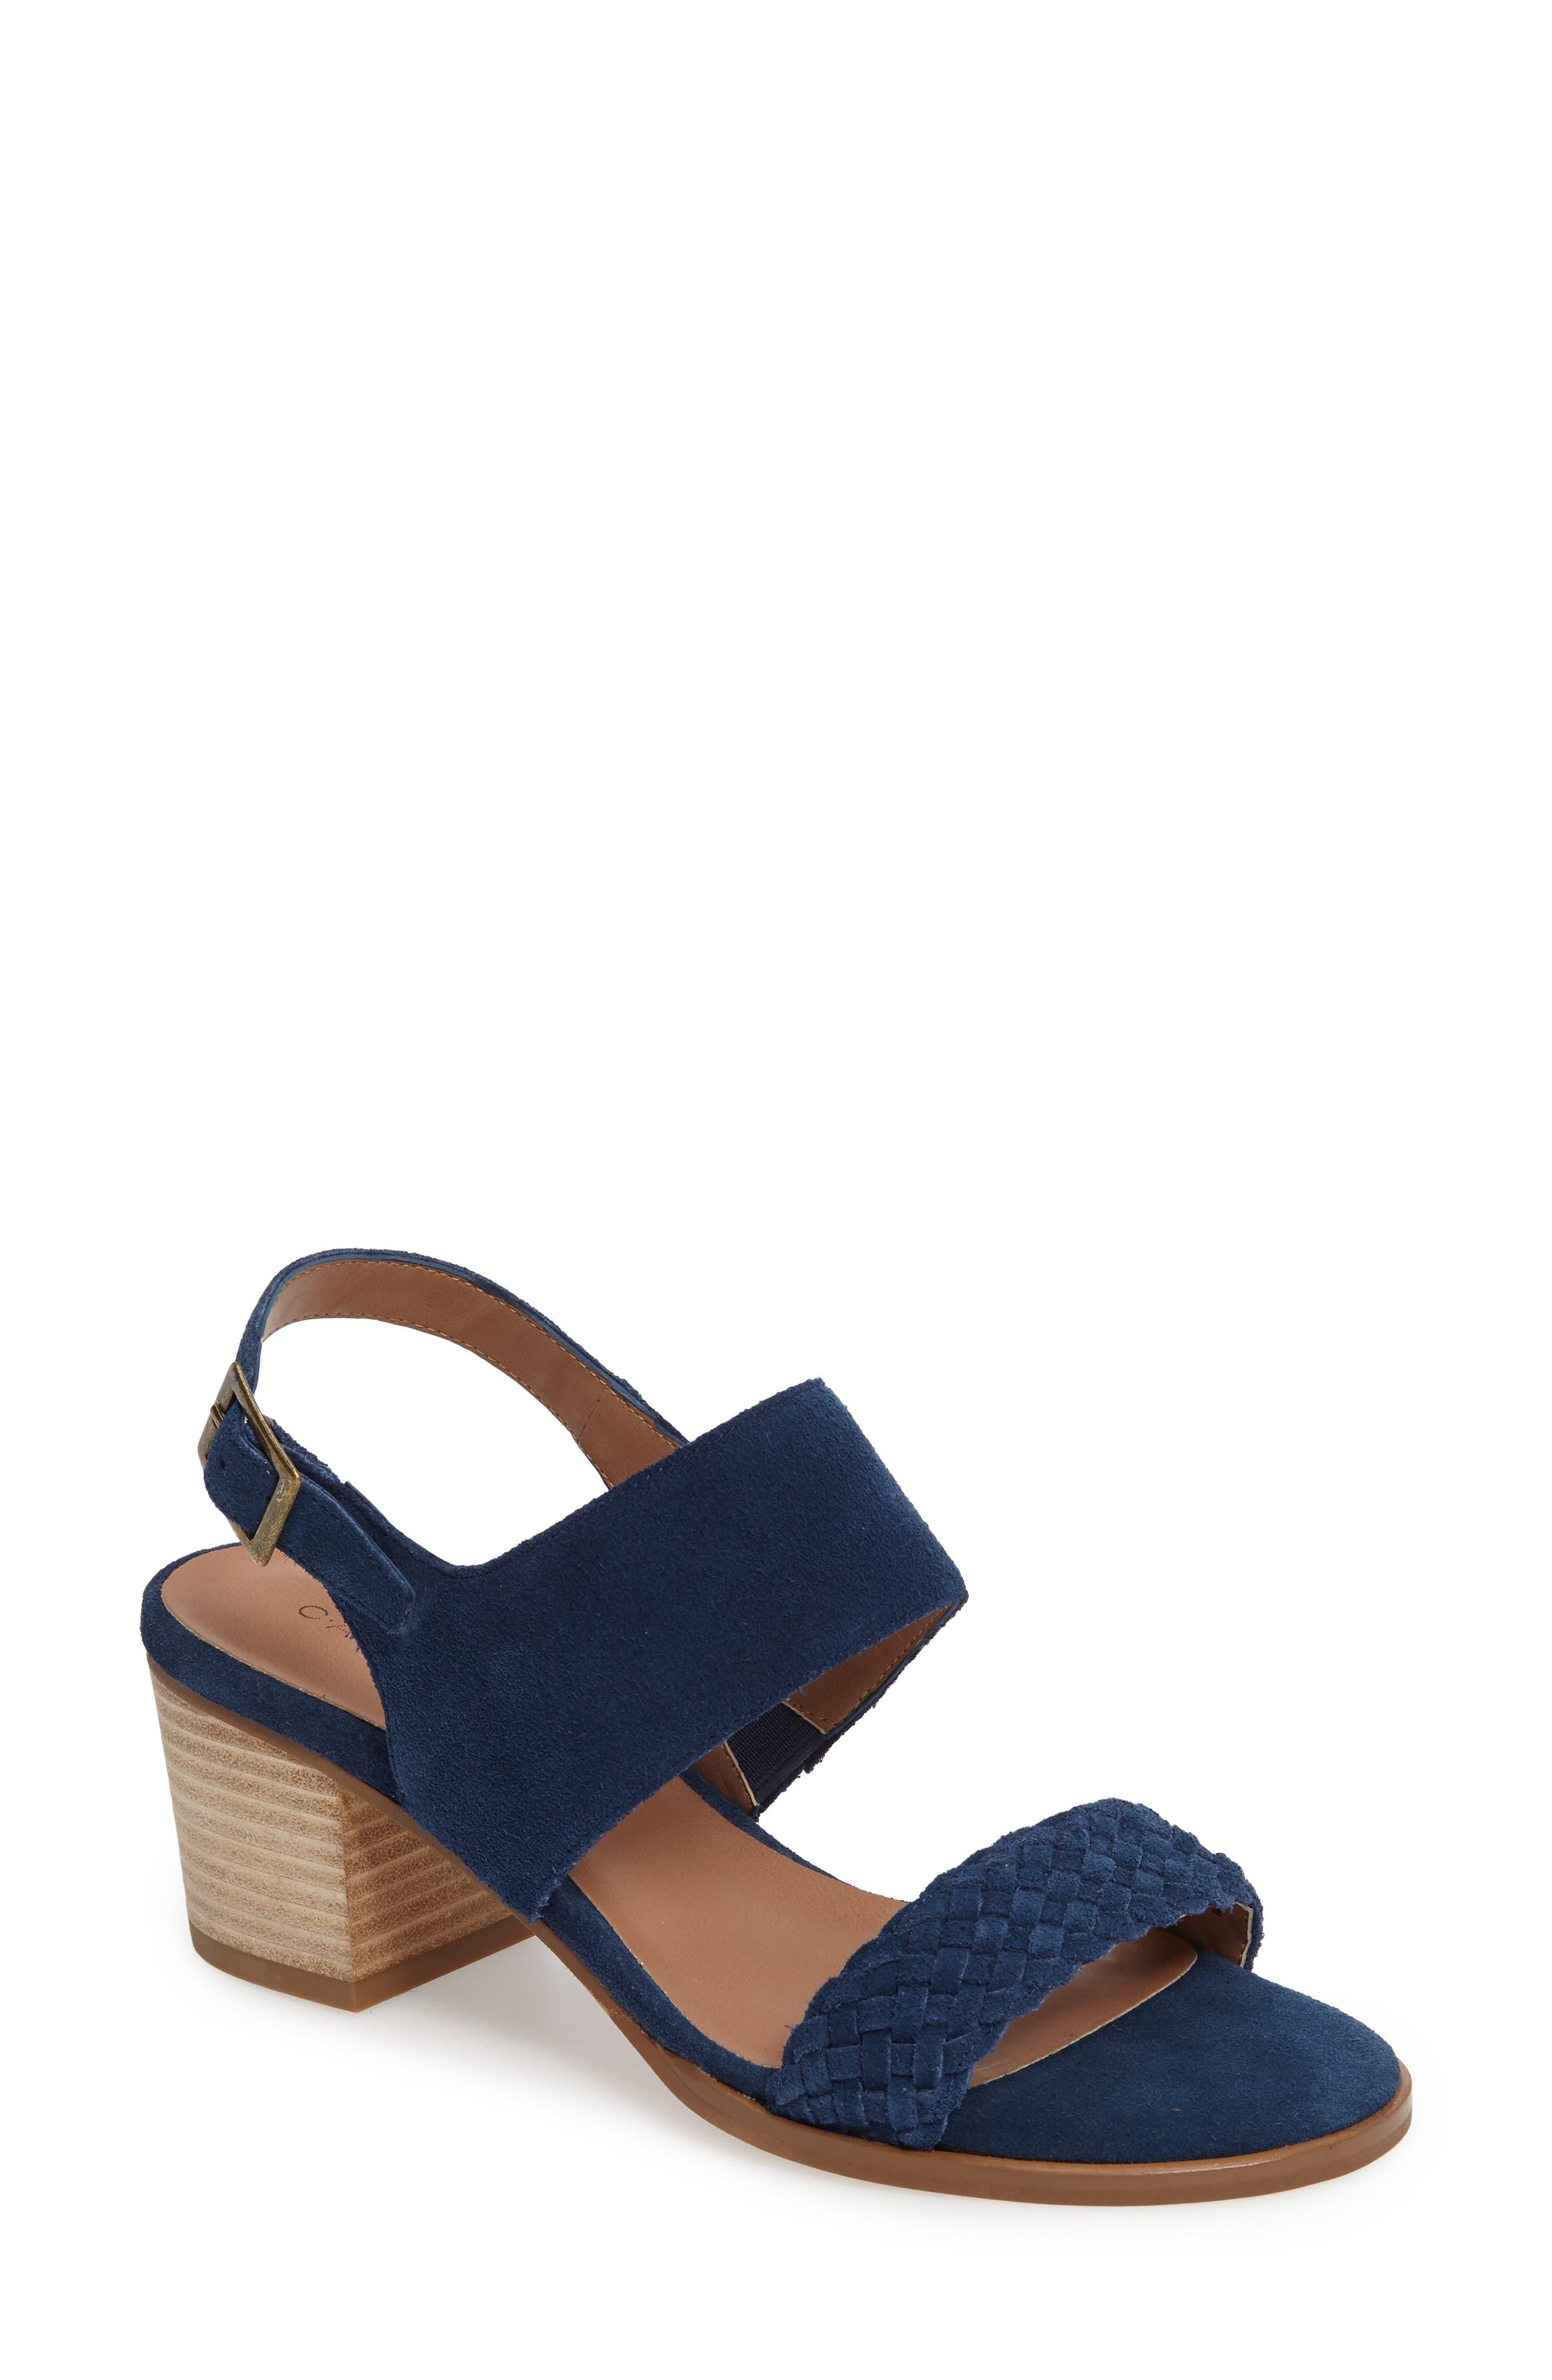 Main Image - Caslon® Carden 2 Sandal (Women)